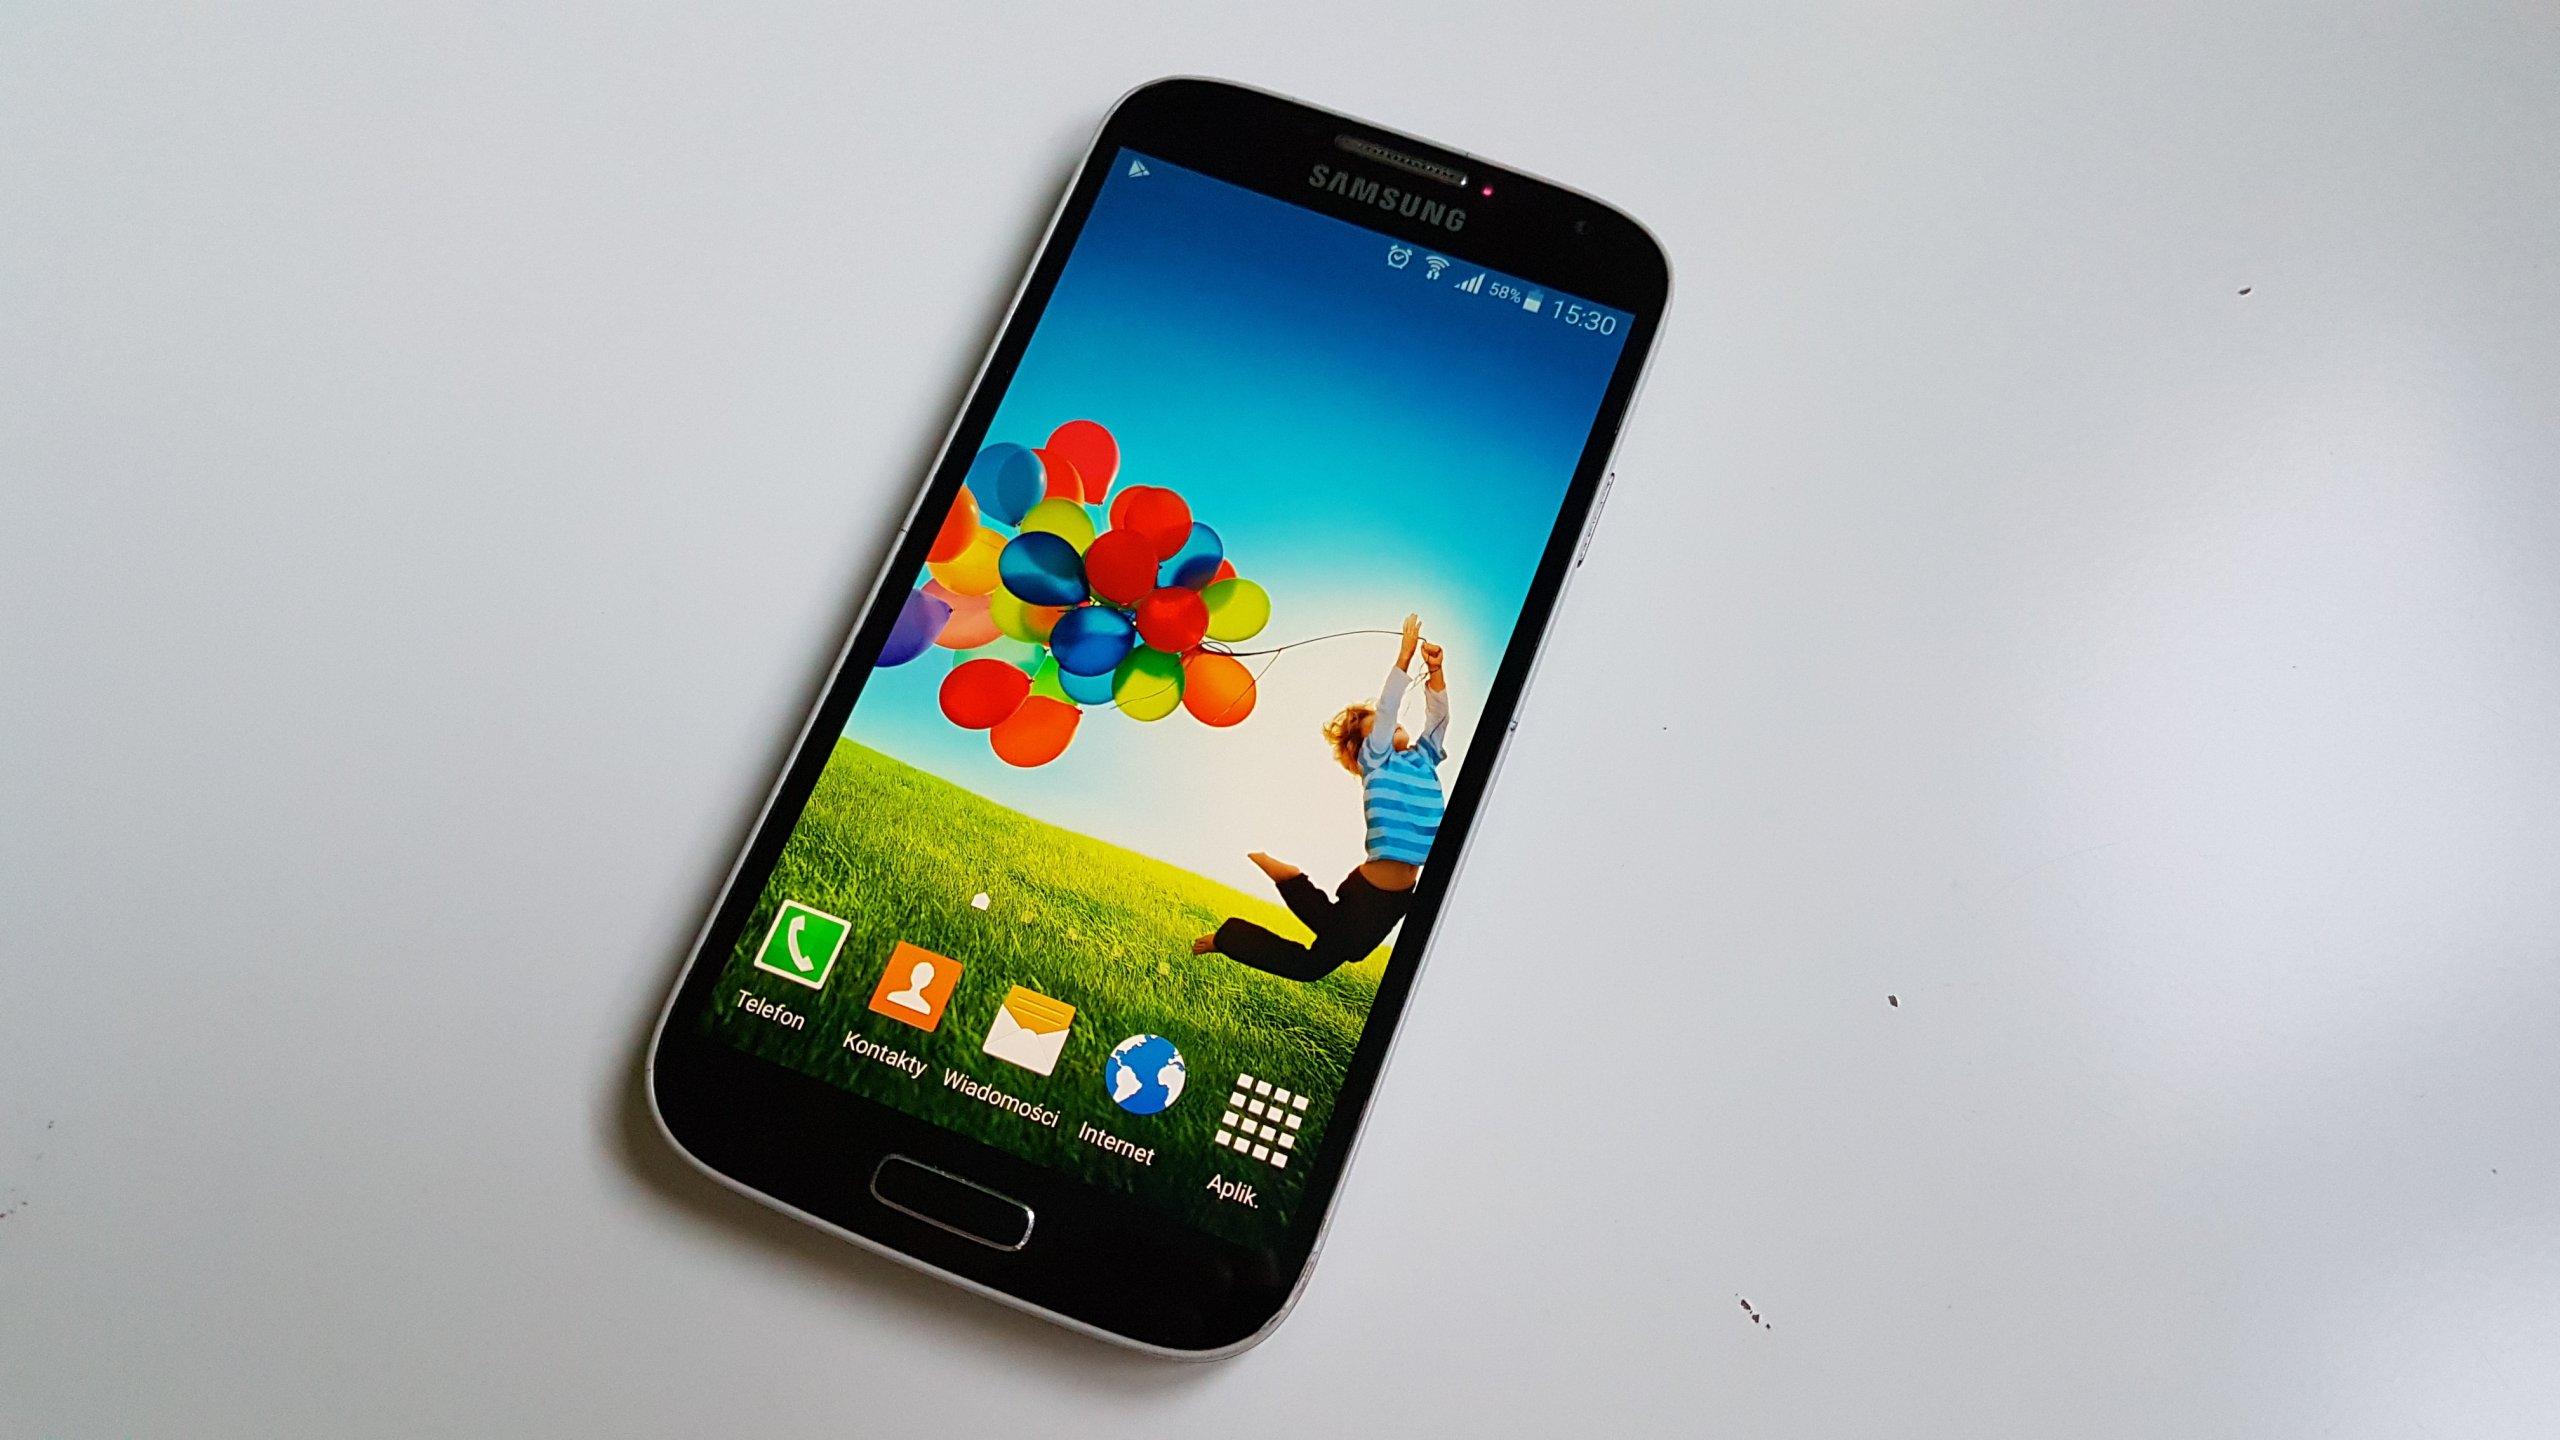 Samsung Galaxy S4 Gt I9505 7064952653 Oficjalne Archiwum Allegro